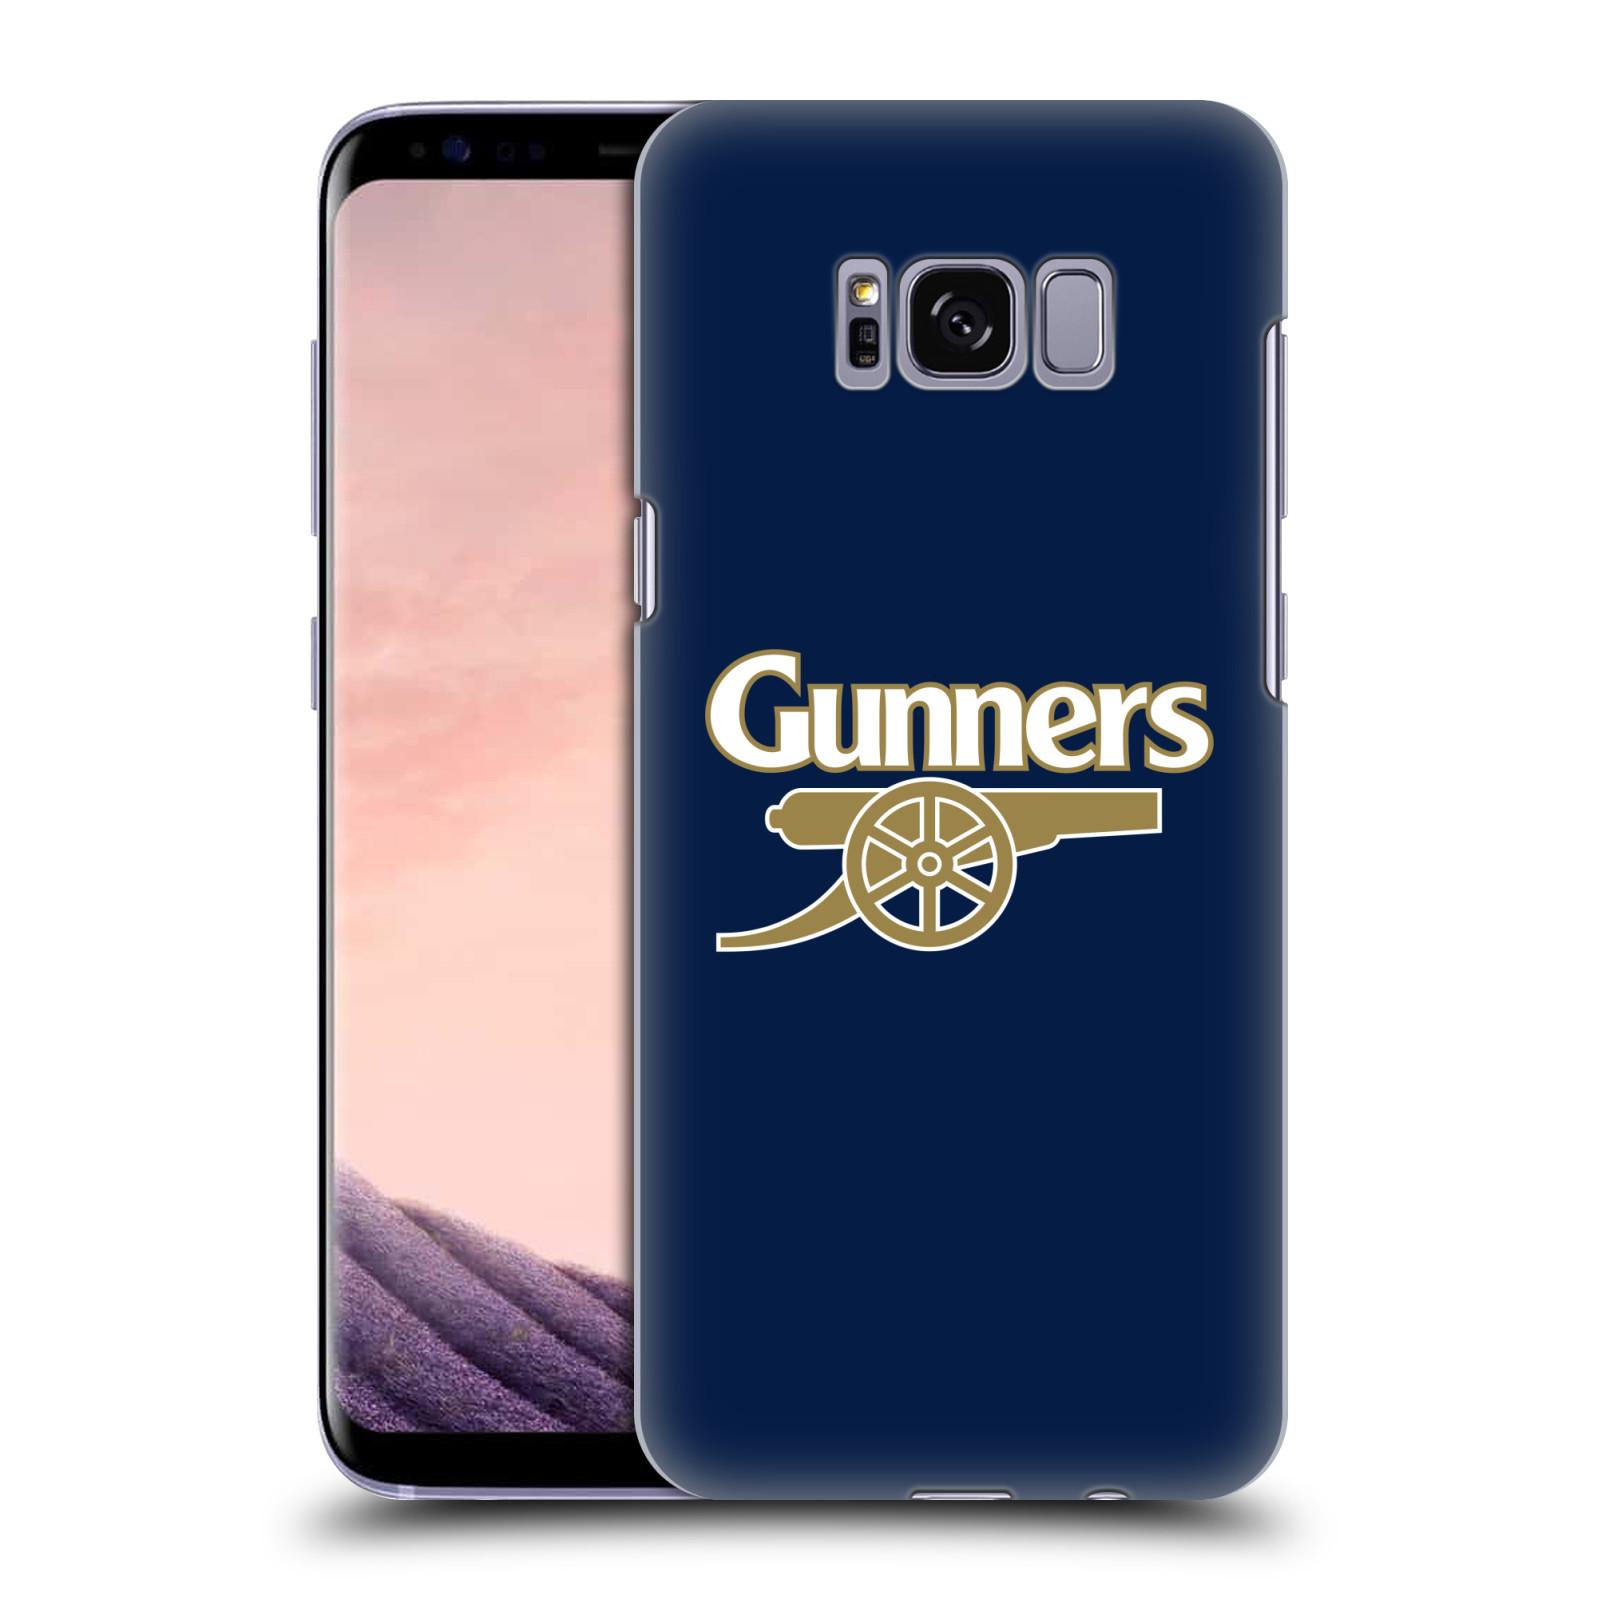 Plastové pouzdro na mobil Samsung Galaxy S8 - Head Case - Arsenal FC - Gunners